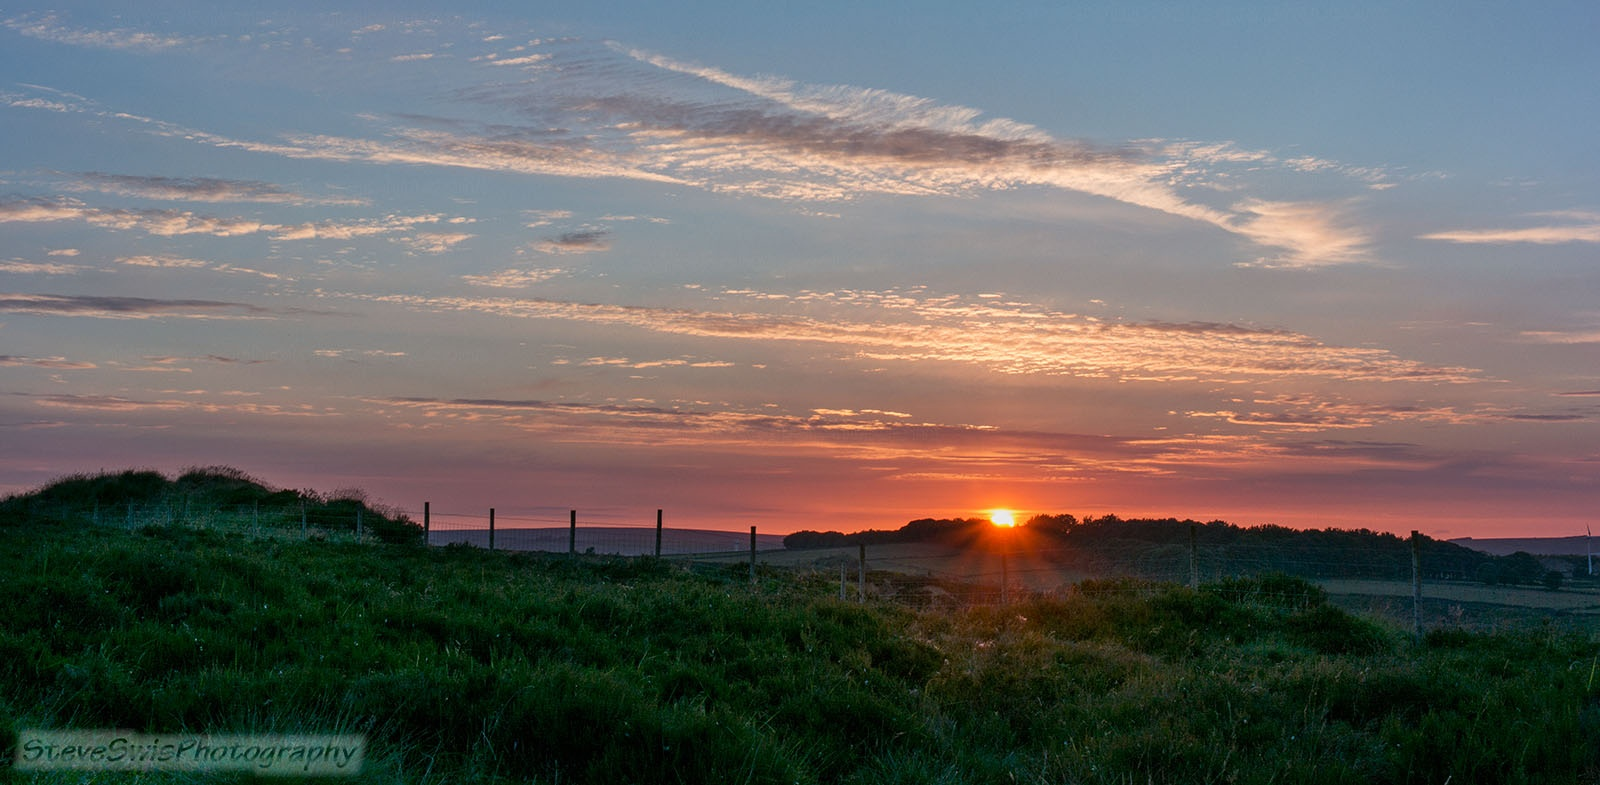 Yorkshire sunset by Steve Swis